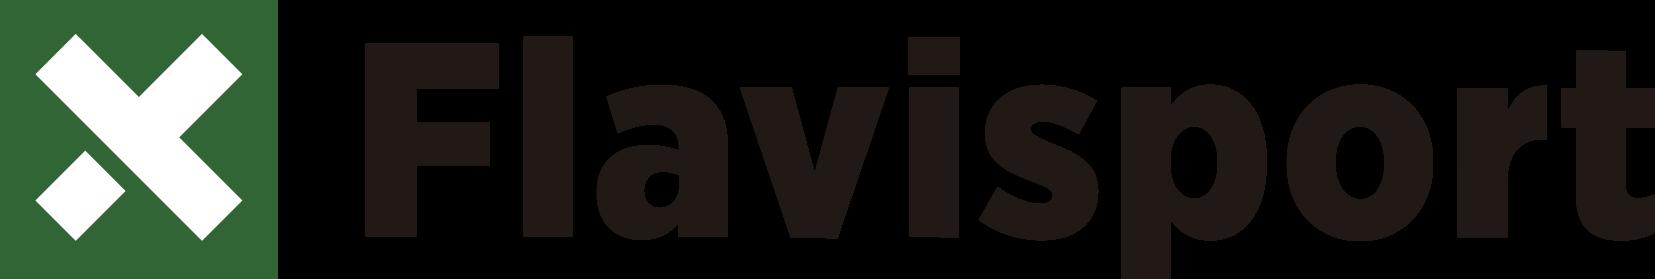 cropped-FLAVISPORT